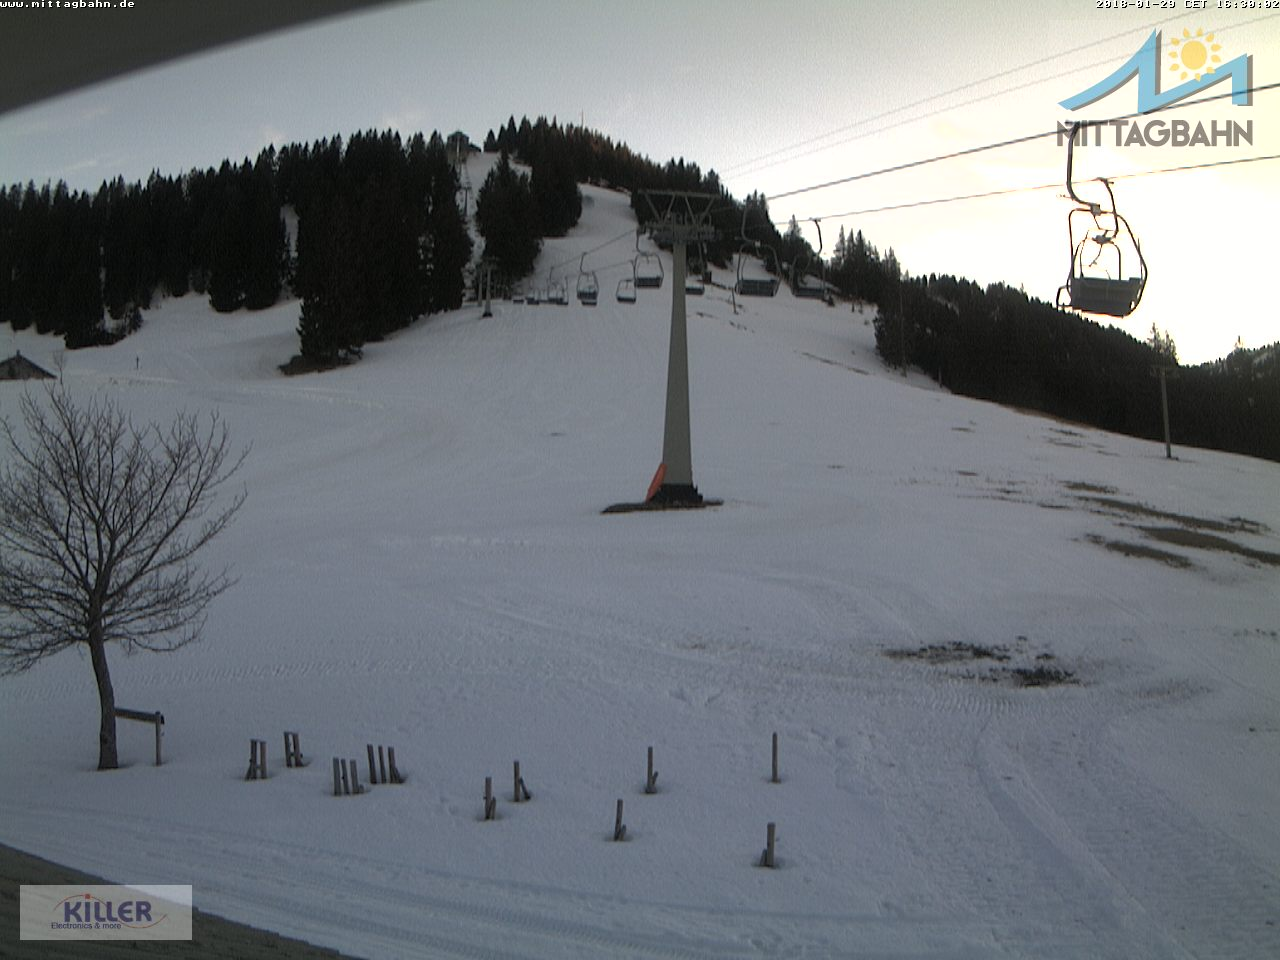 Webcam Ski Resort Immenstadt - Mittag cam 5 - Bavaria Alps - Allgäu